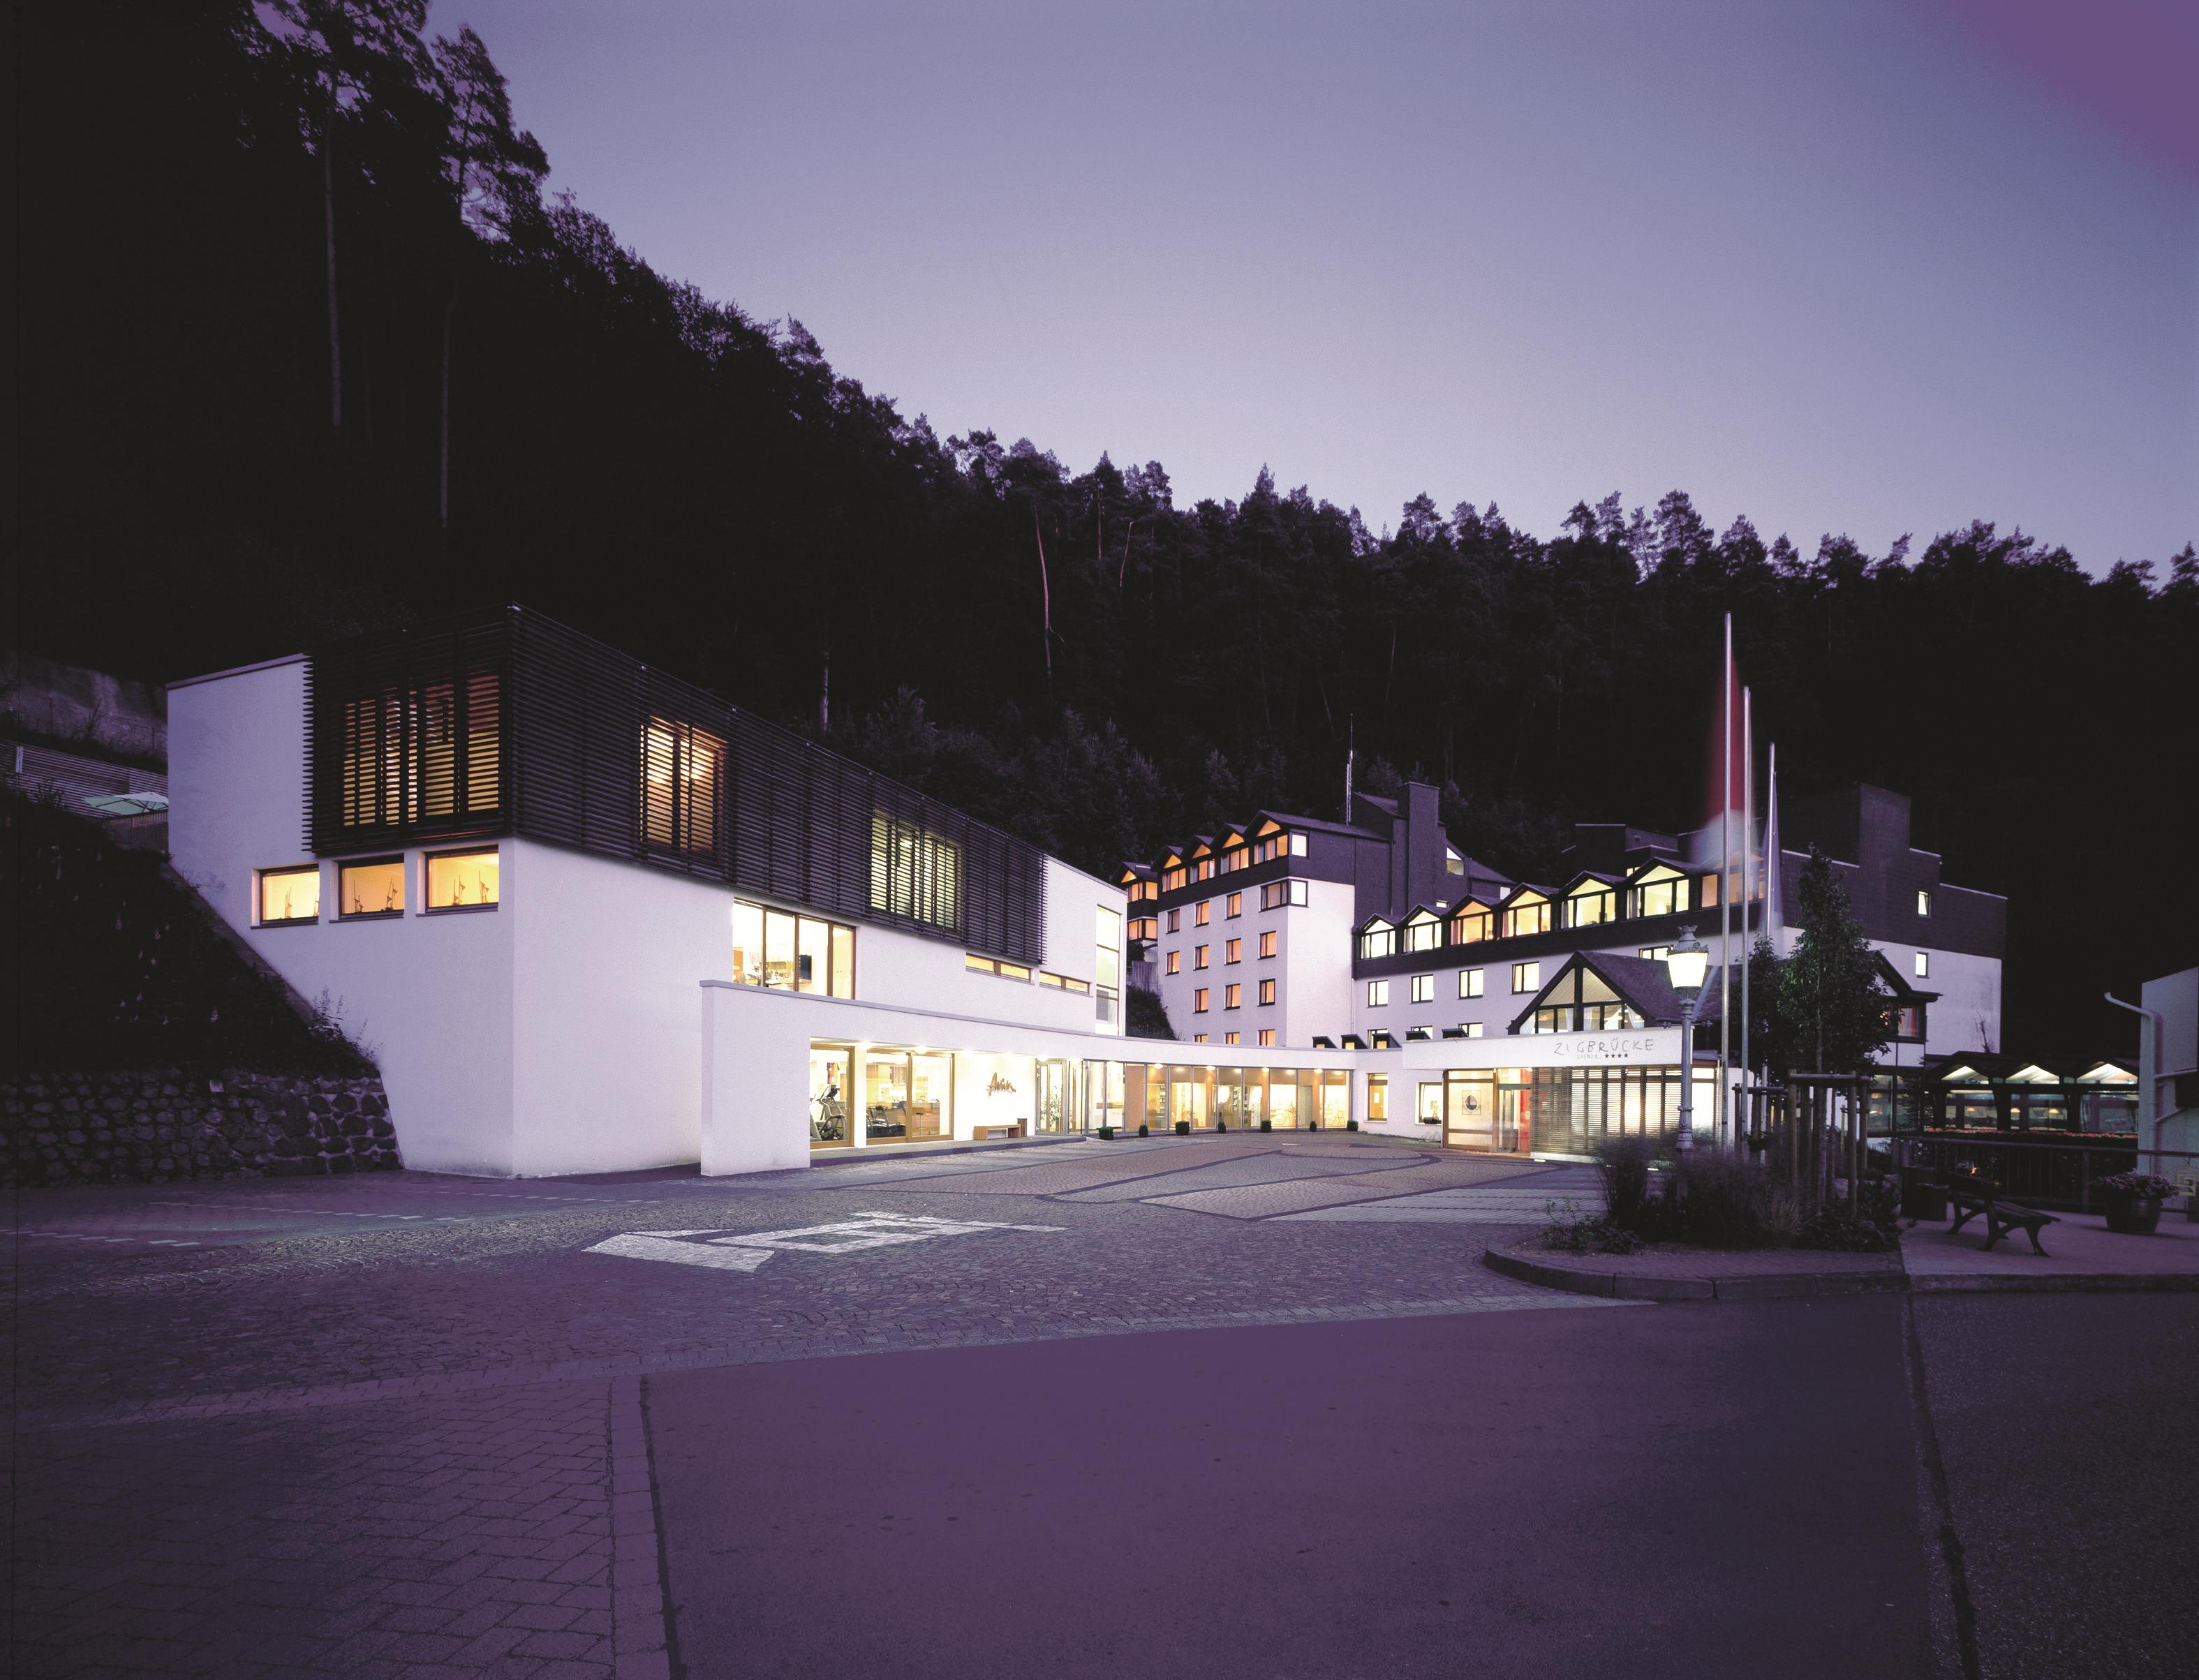 Hotel zugbr cke responsive design hotel webseite for Design hotels germany